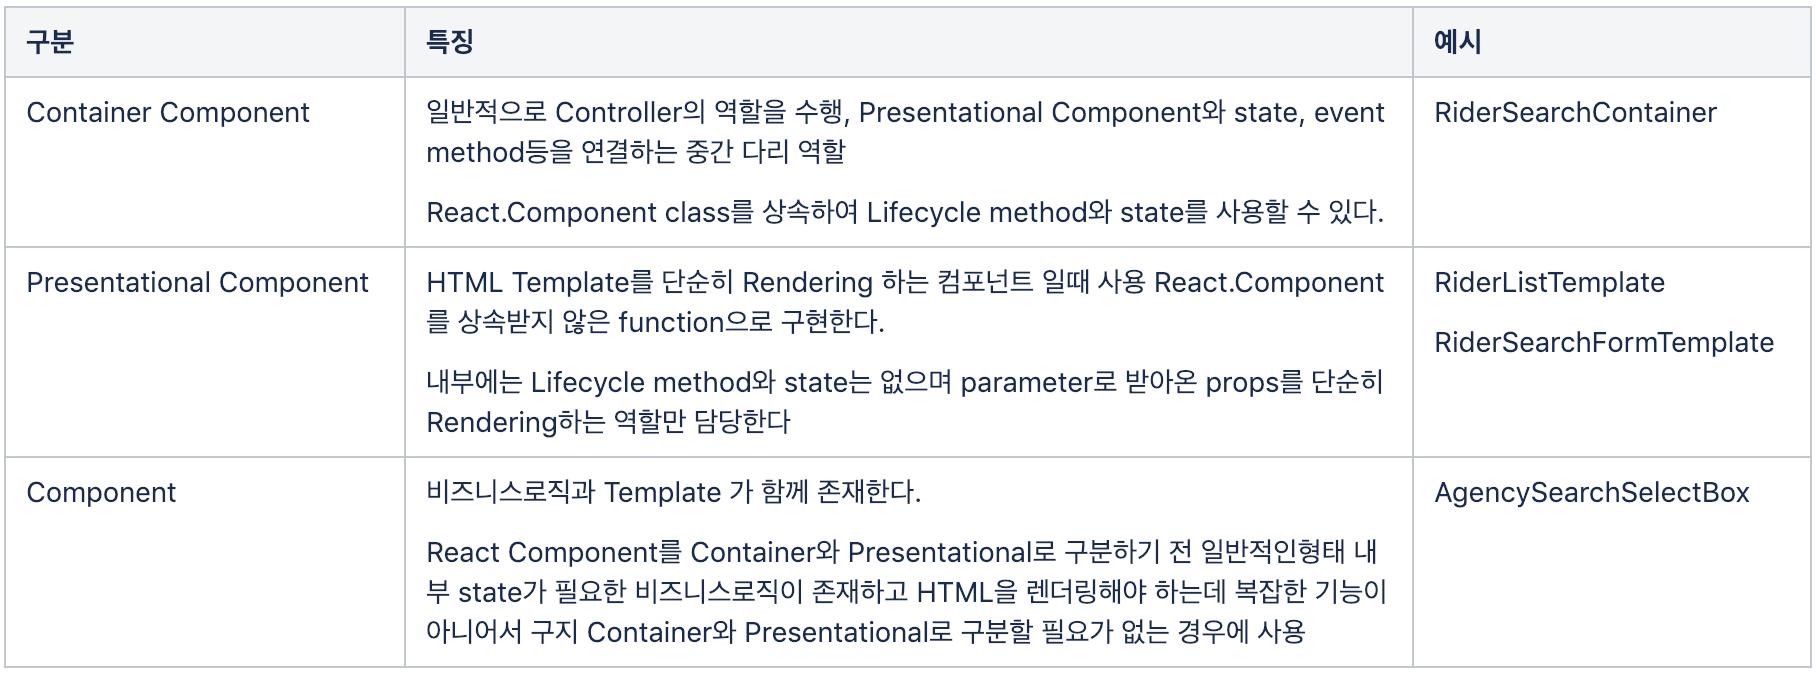 component-type